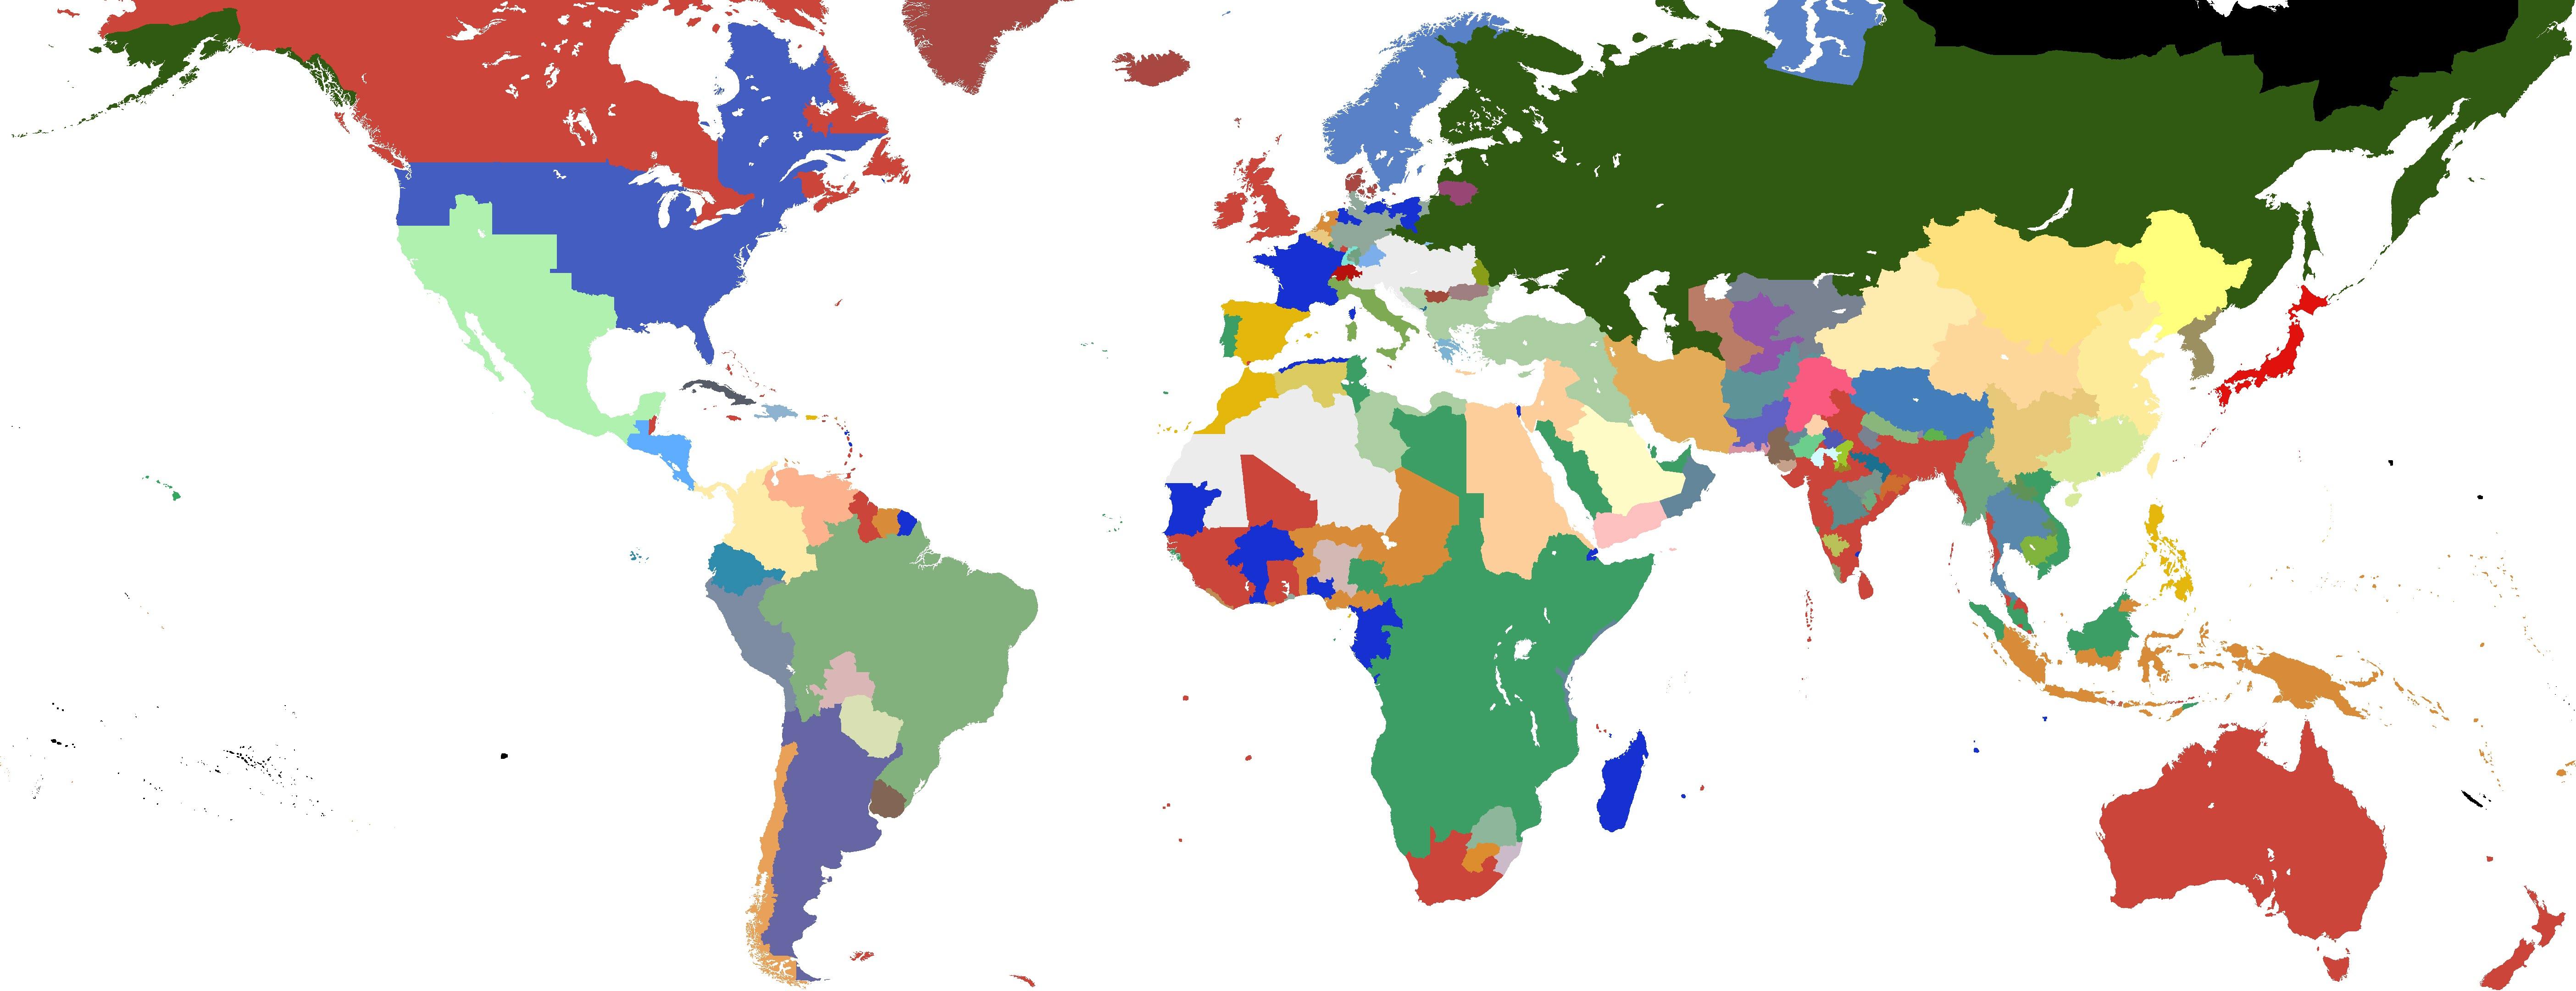 V2_MAP_POR_1886.9.22_3.jpg